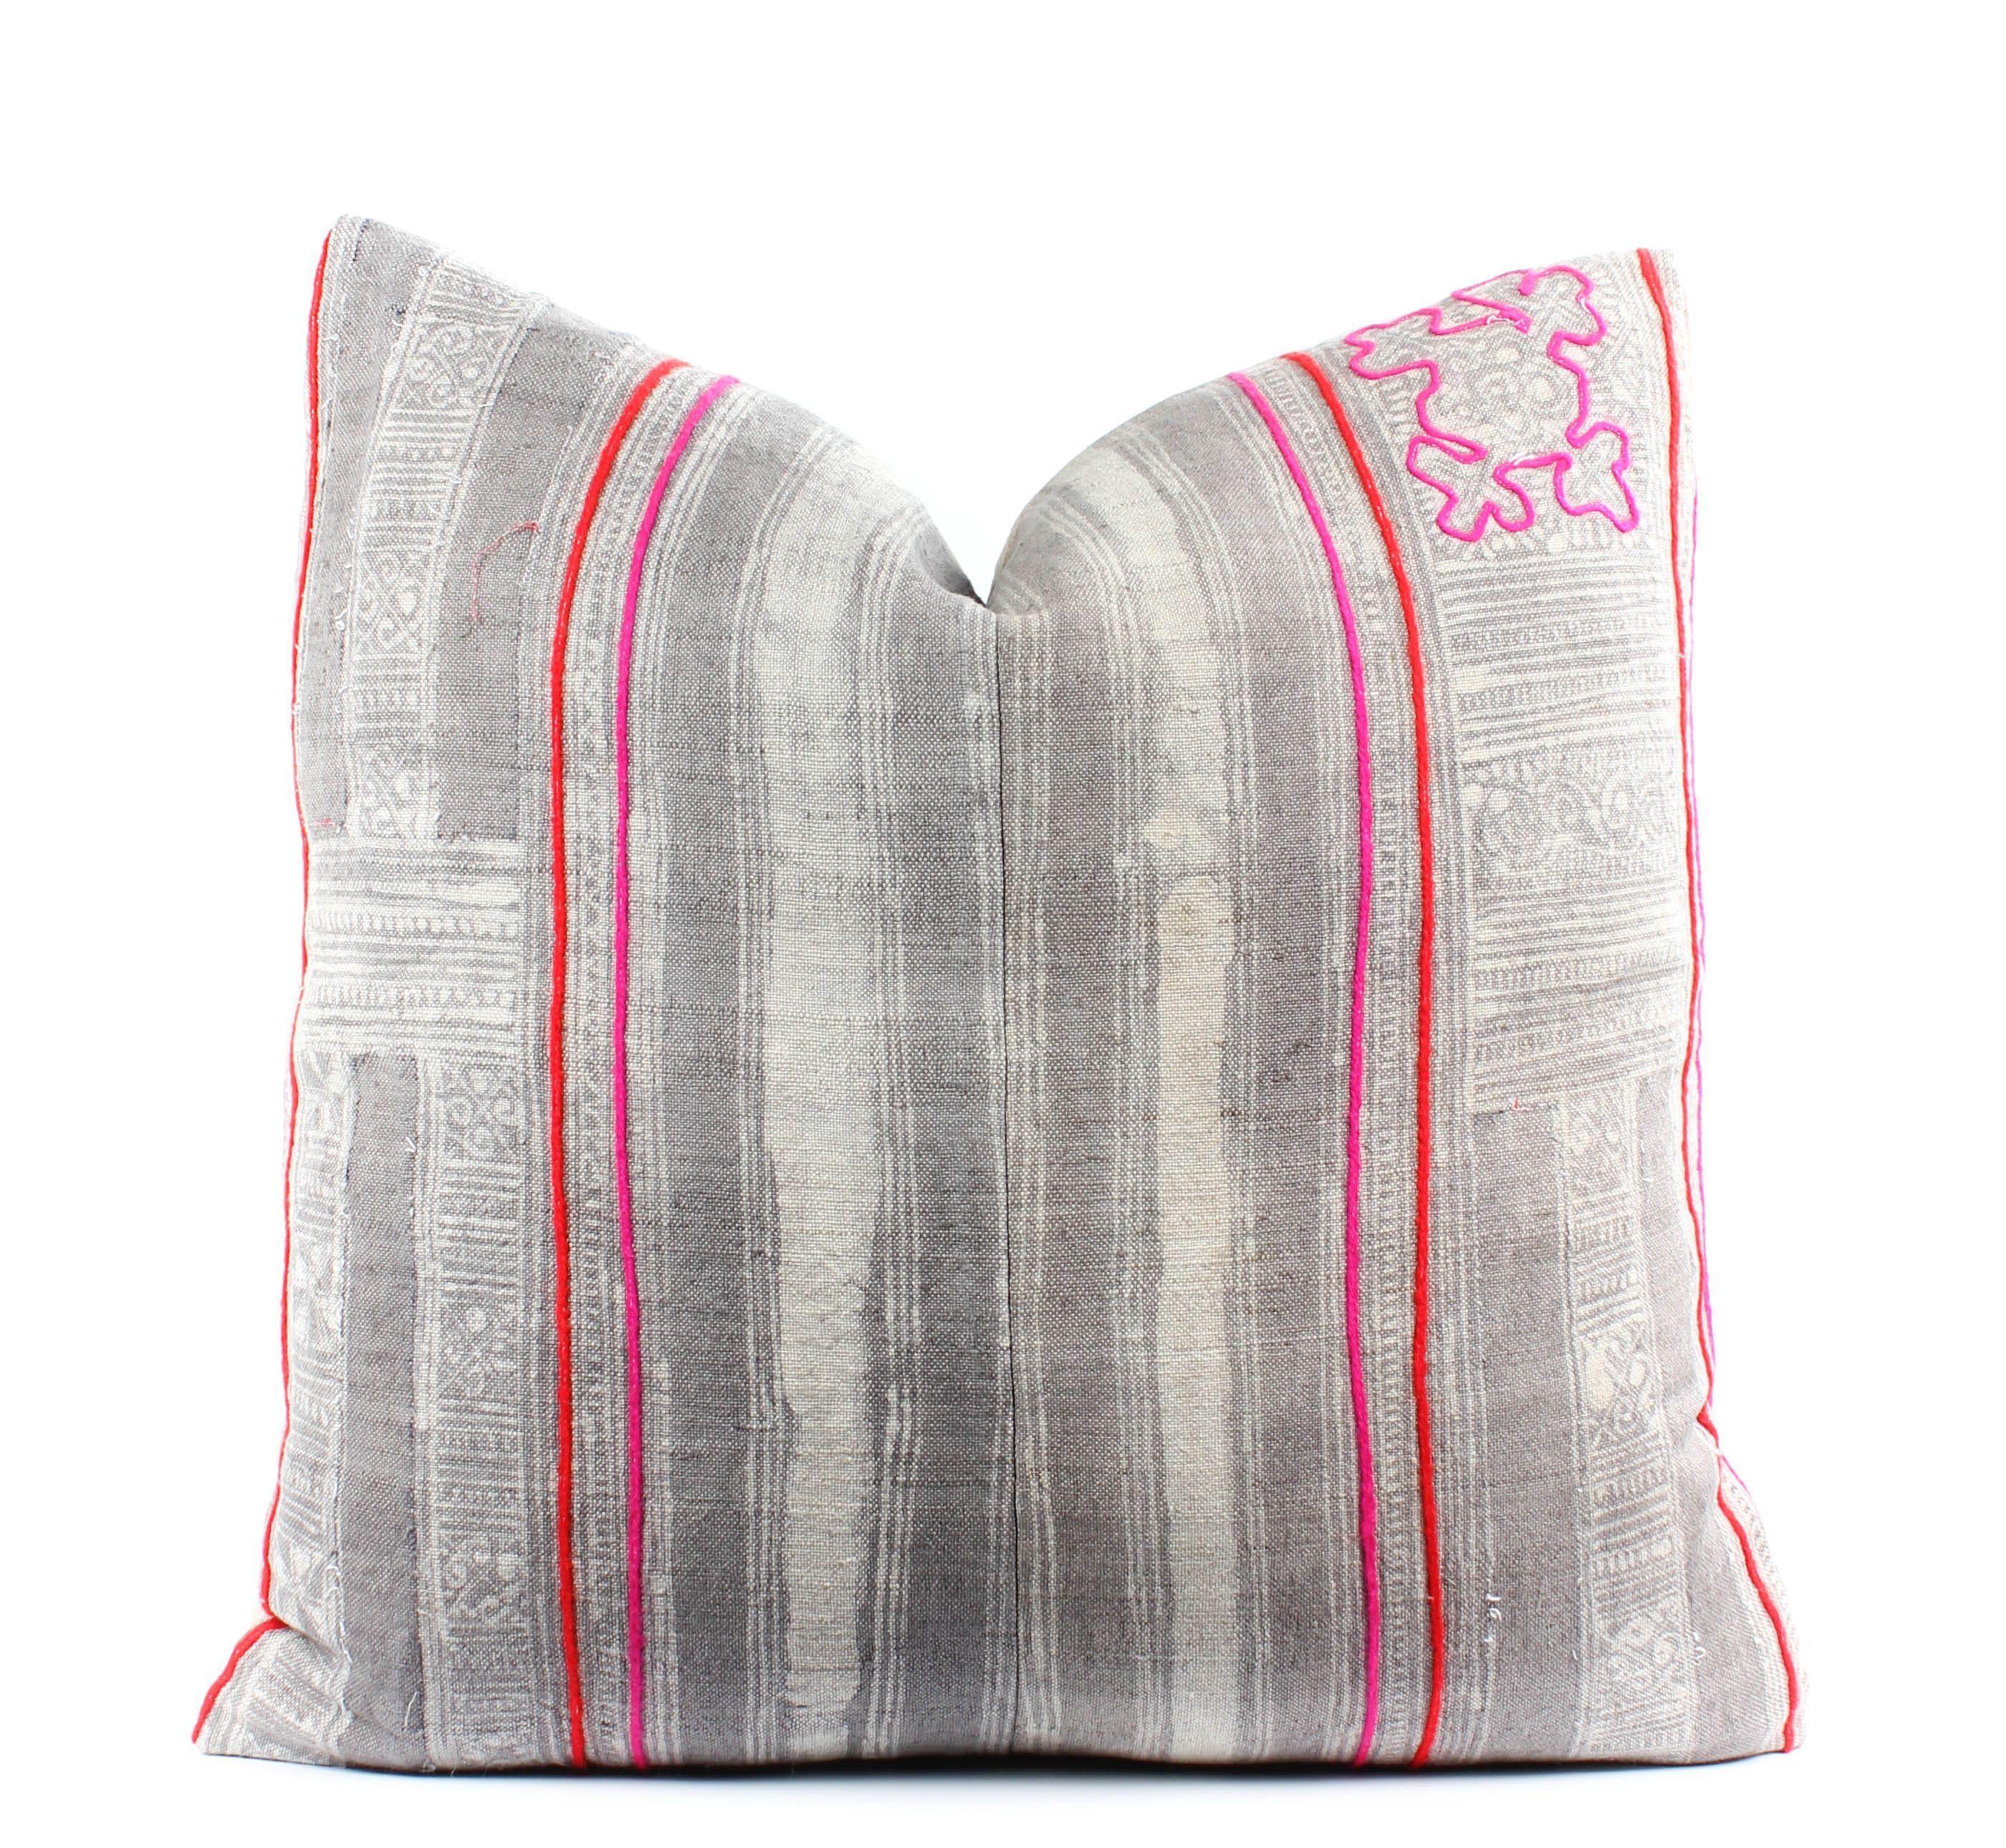 Vintage hmong gray batik pillow cover boho pillow textile pink